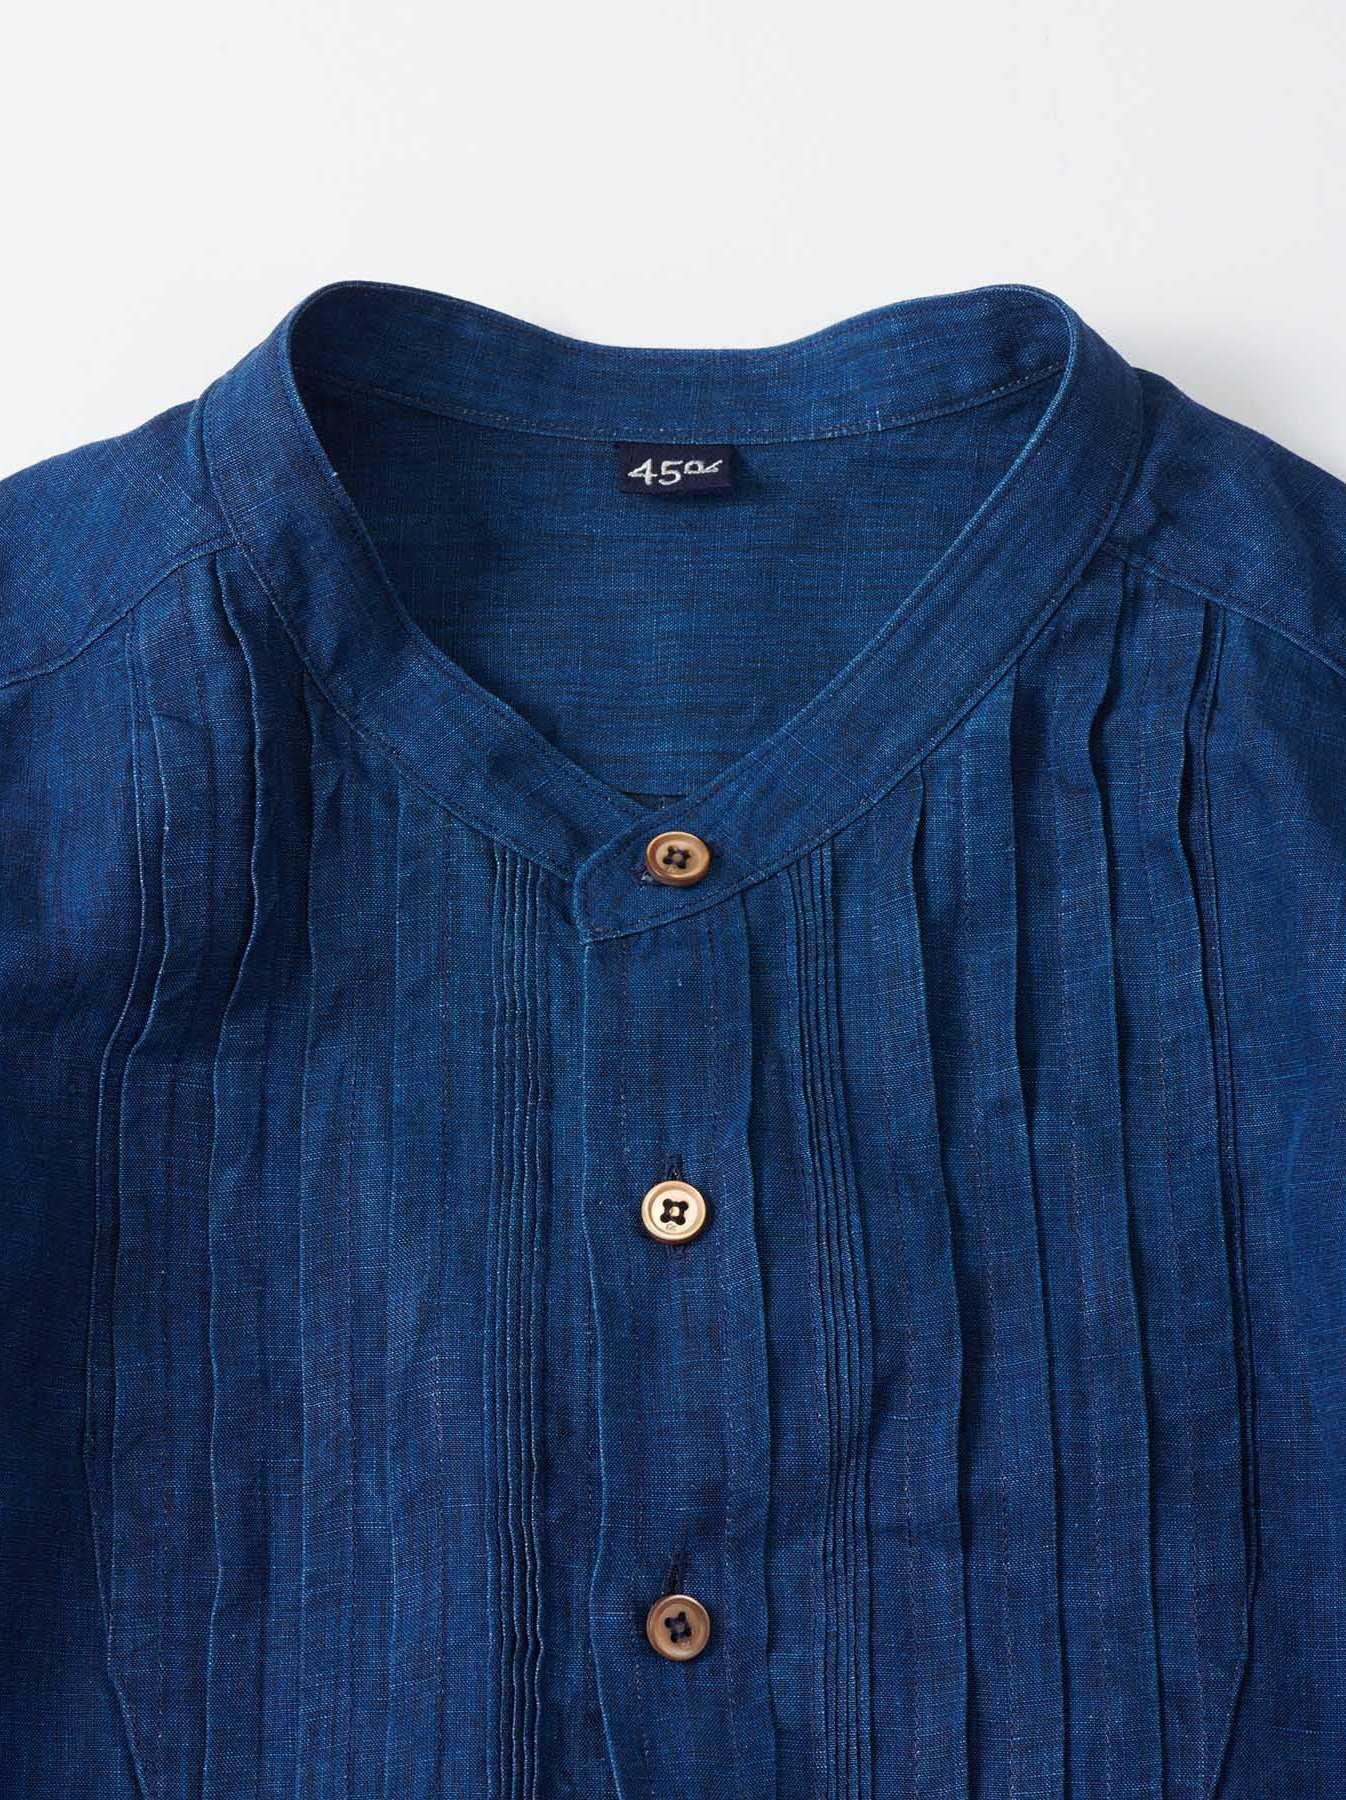 WH Indigo Linen Pin-tuck 908 Shirt-8